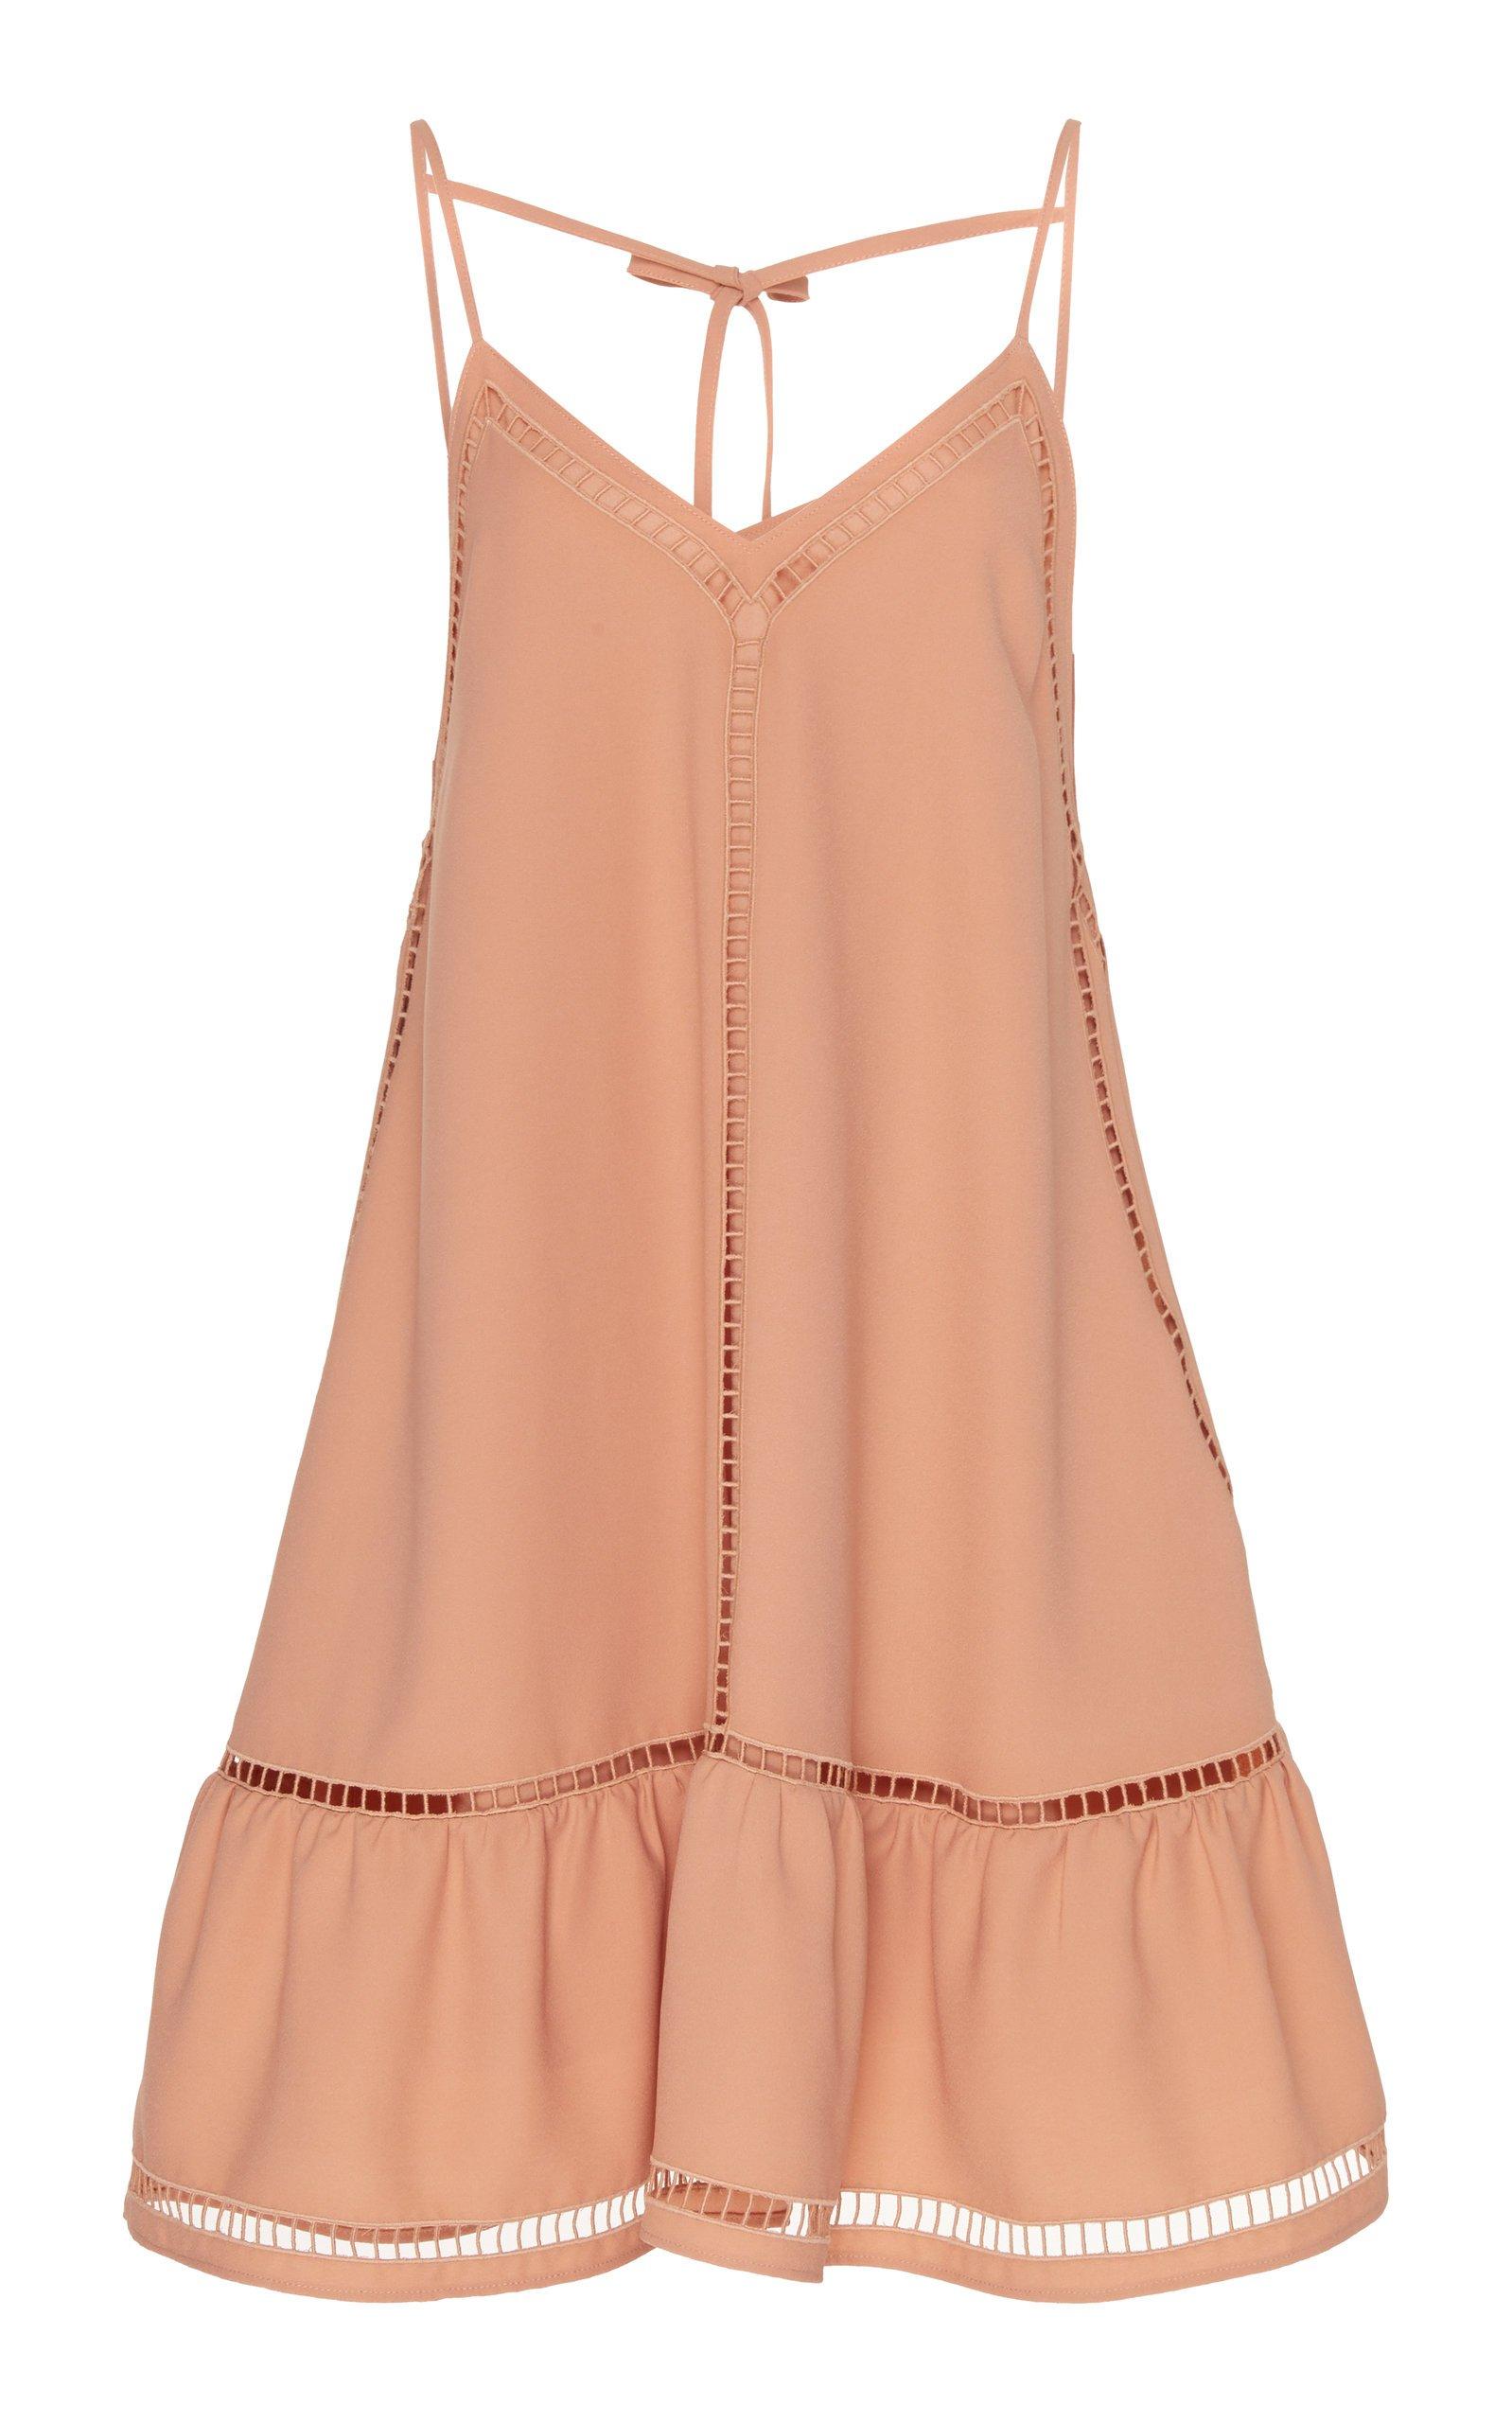 Red Valentino Pointelle Crepe De Chine Slip Mini Dress Size: 36